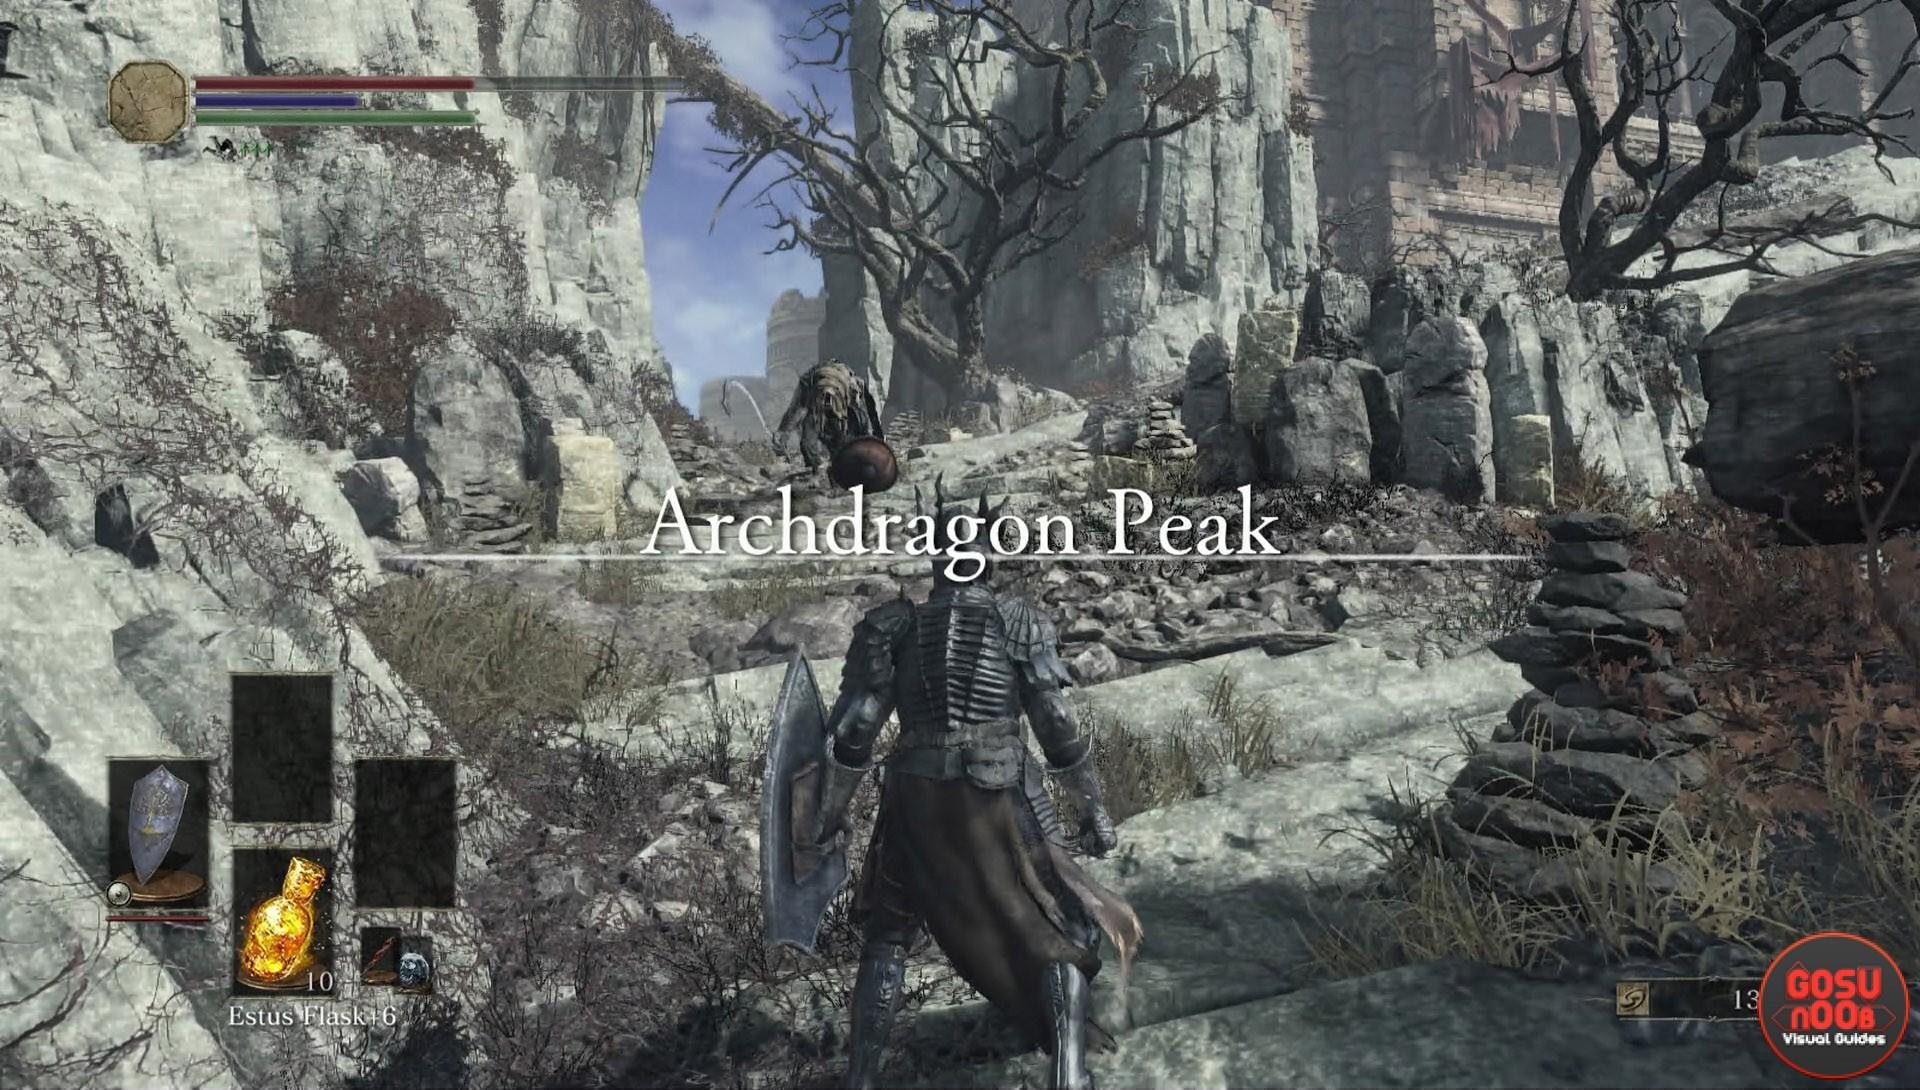 Archdragon peak secret area dark souls gosu noob